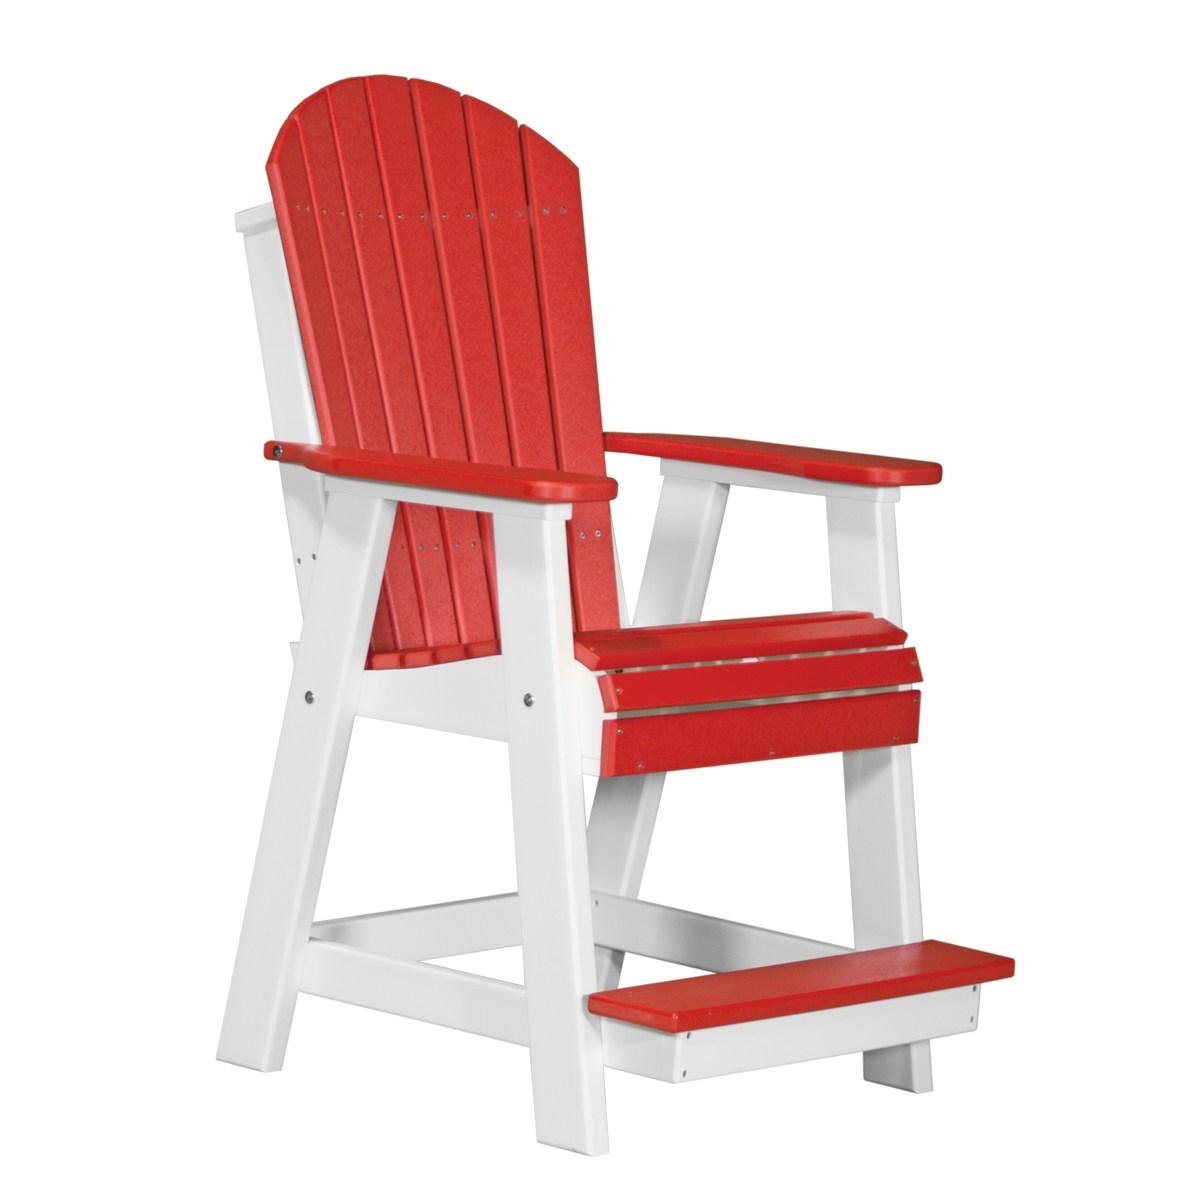 adirondack chairs made in usa walmart wheel balcony chair recycled patio fine oak things